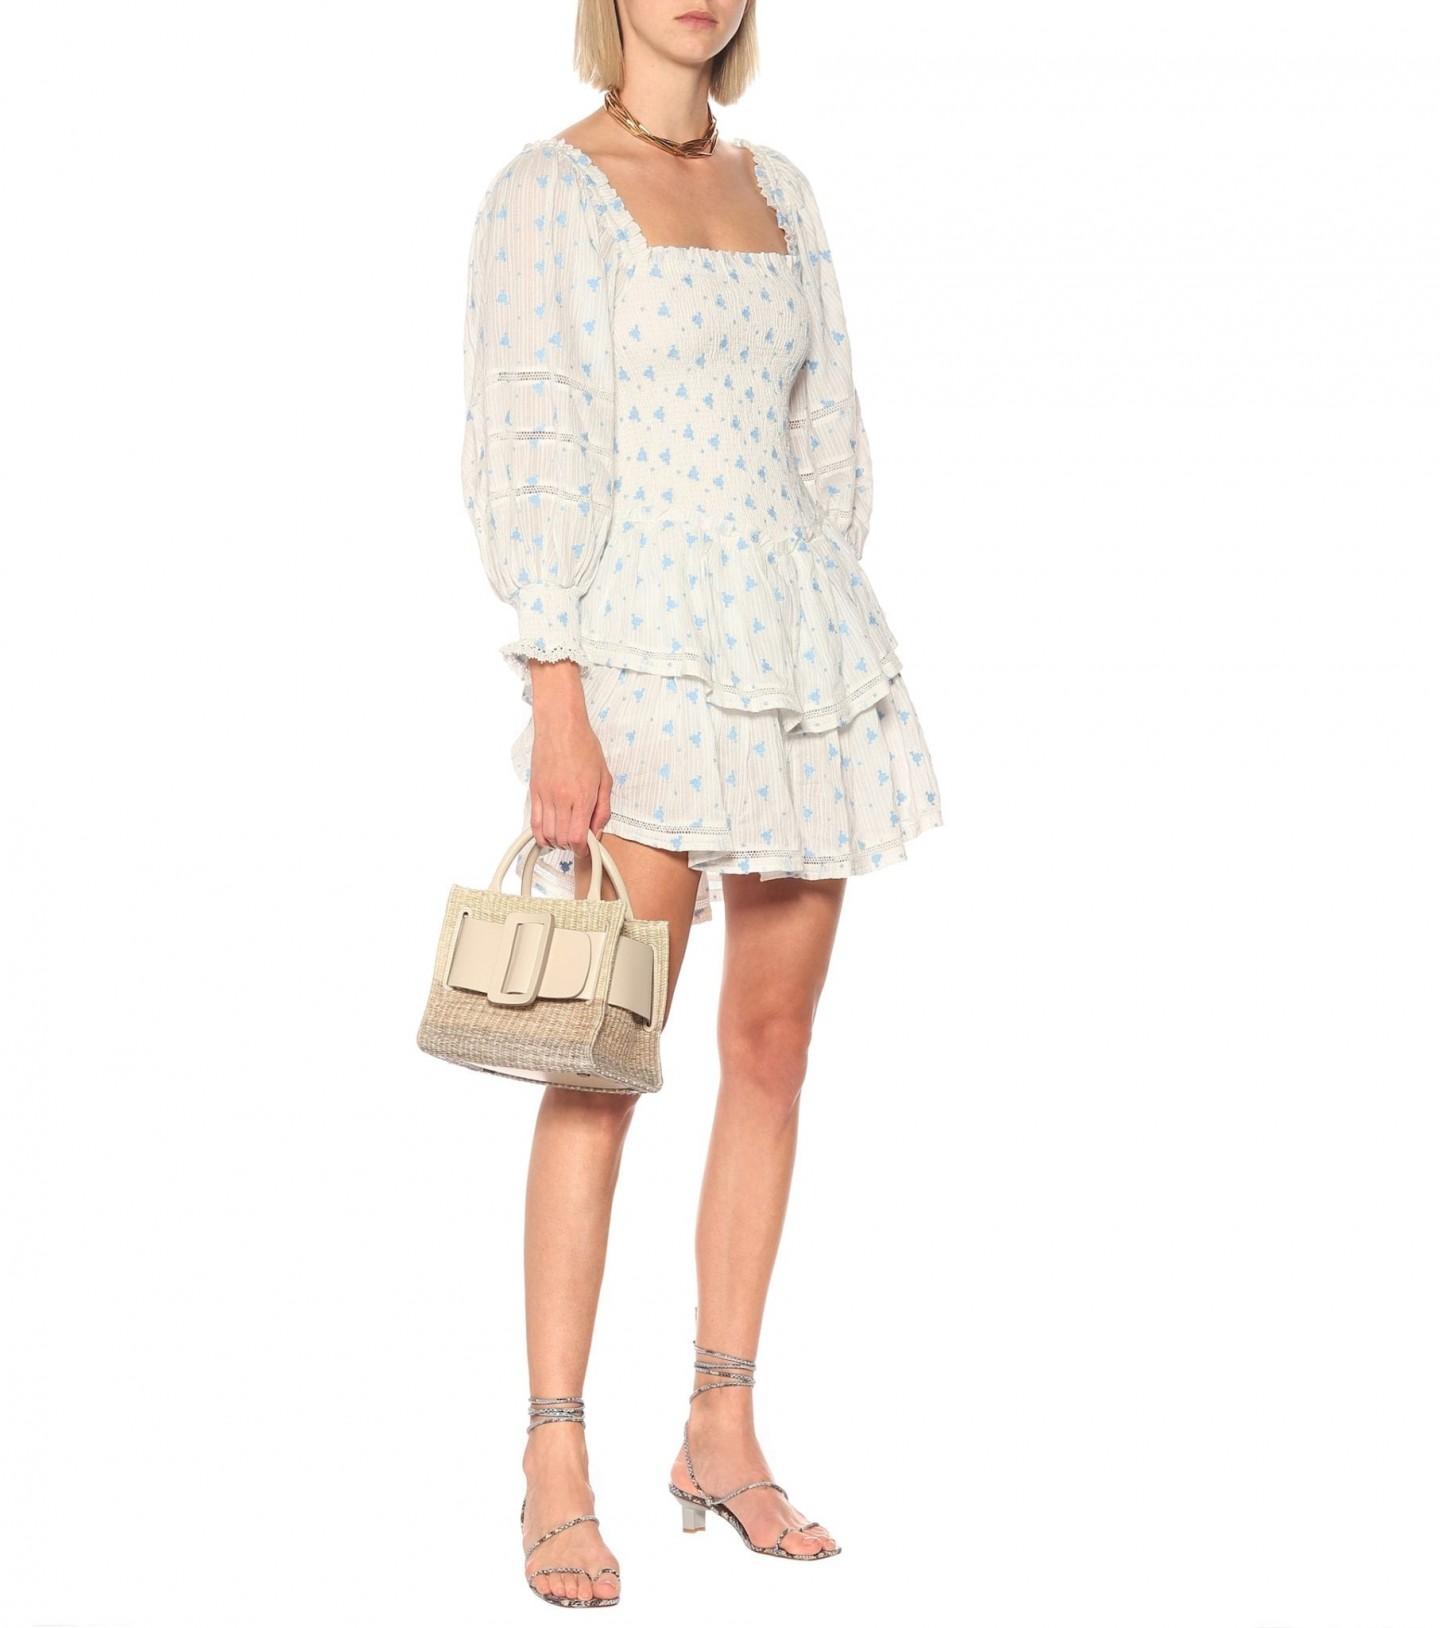 LOVESHACKFANCY Exclusive To Mytheresa – Raelynn Floral Cotton Mini Dress